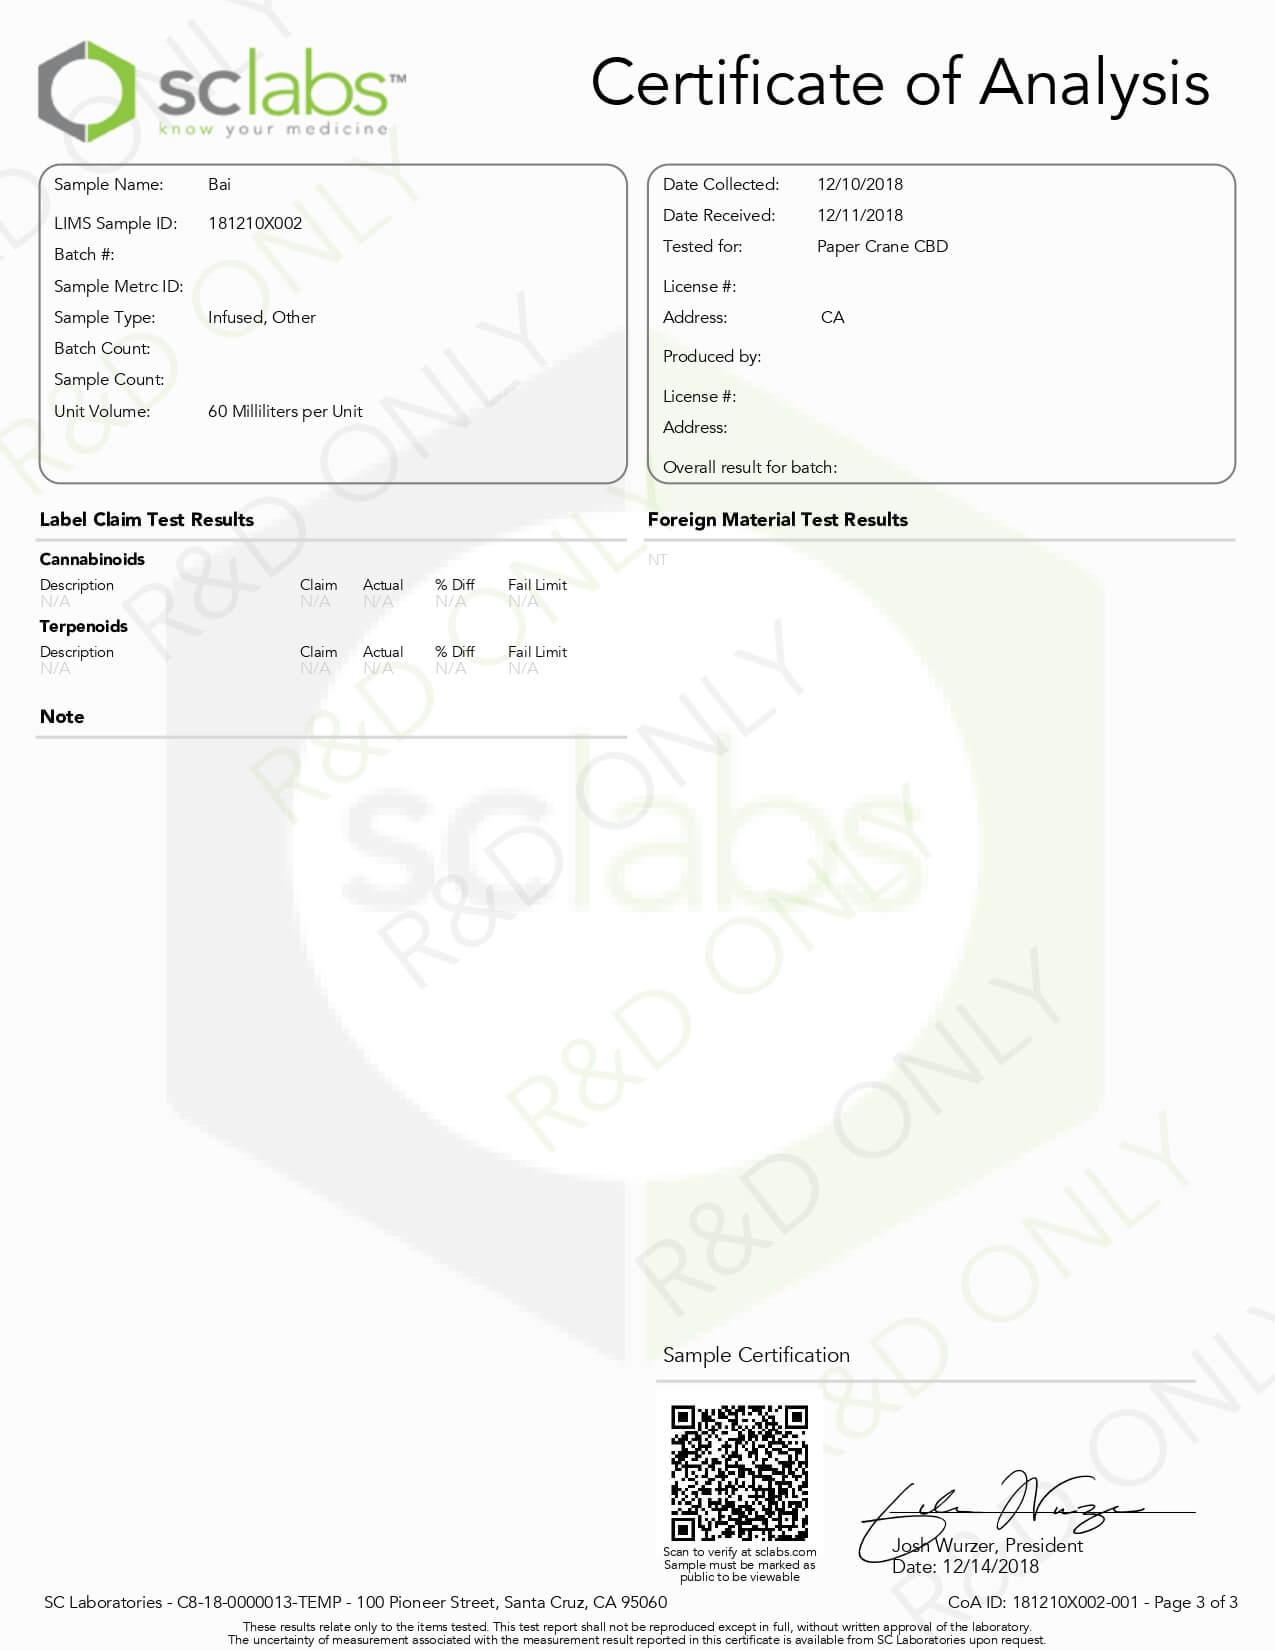 PaperCraneCBD Tincture Bai 2500mg Lab Report